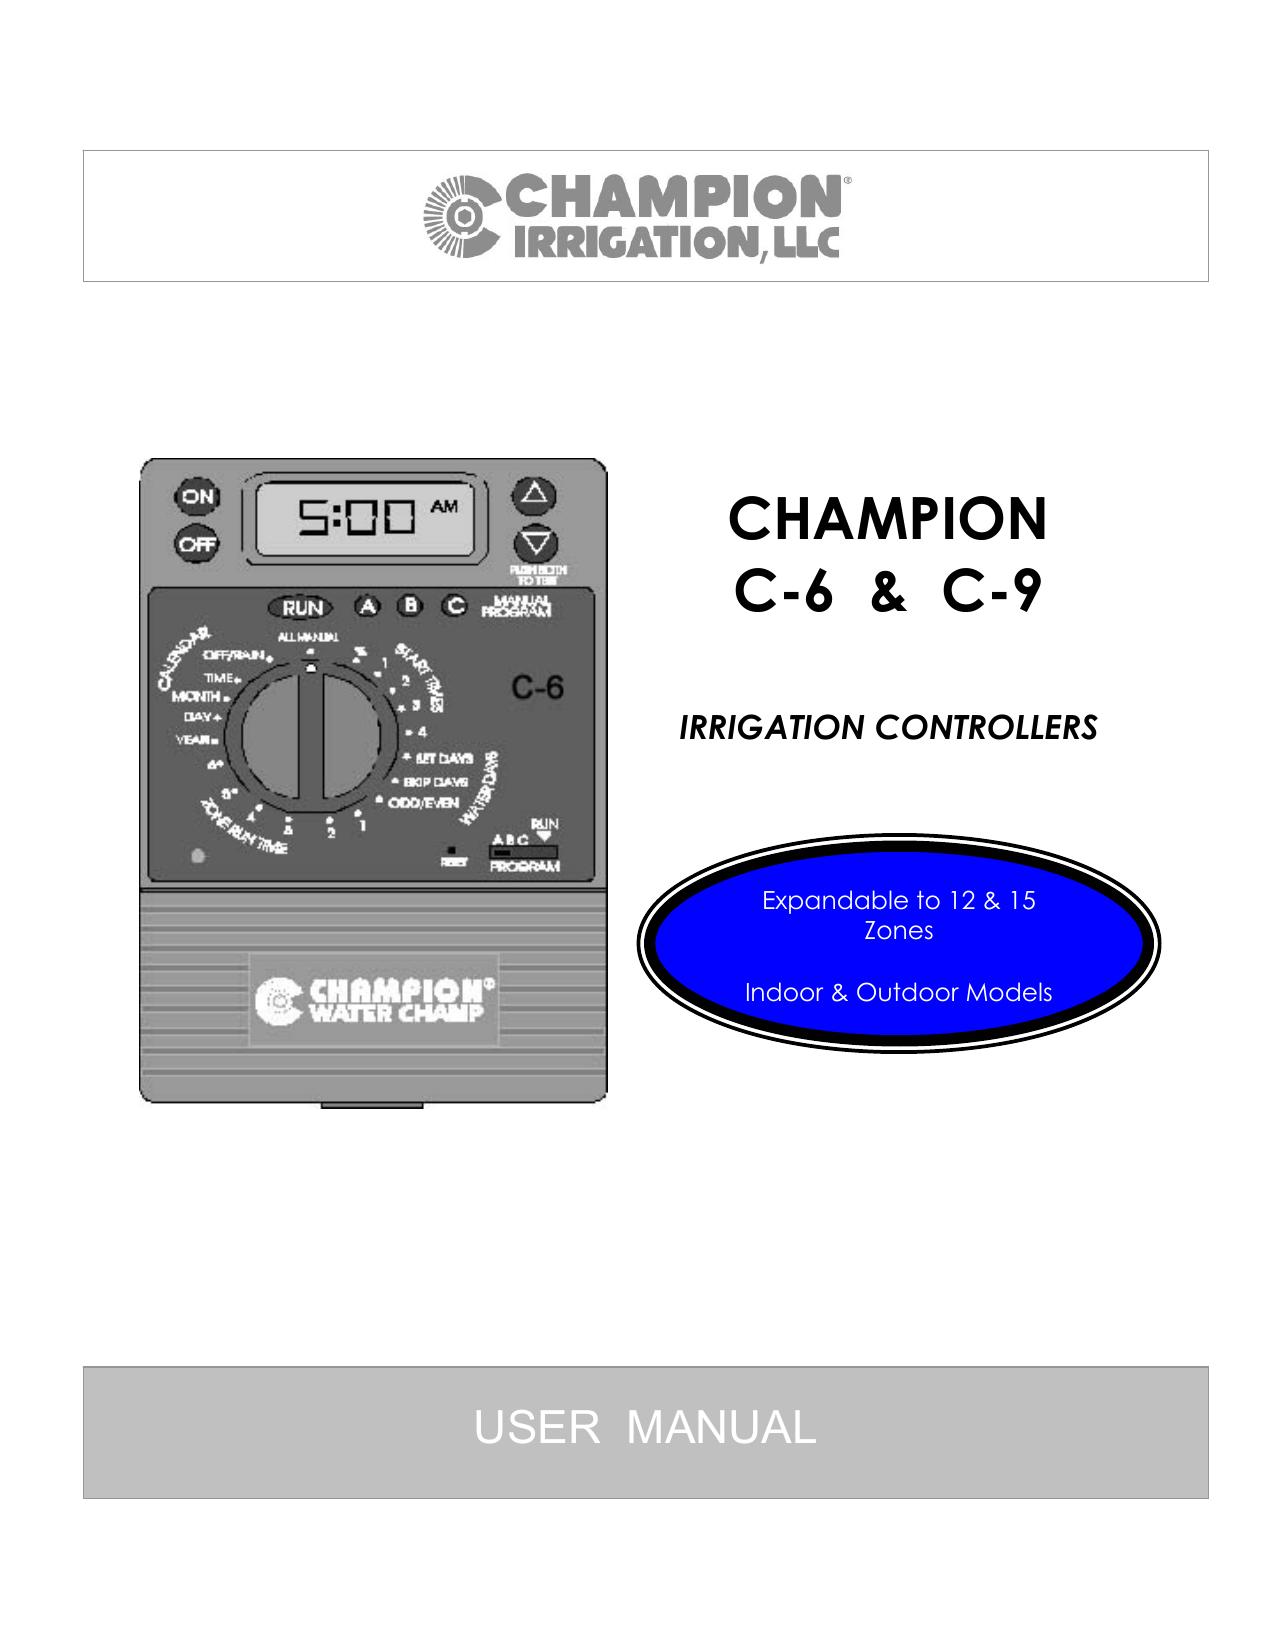 champion irrigation products c 9 user manual manualzz com rh manualzz com